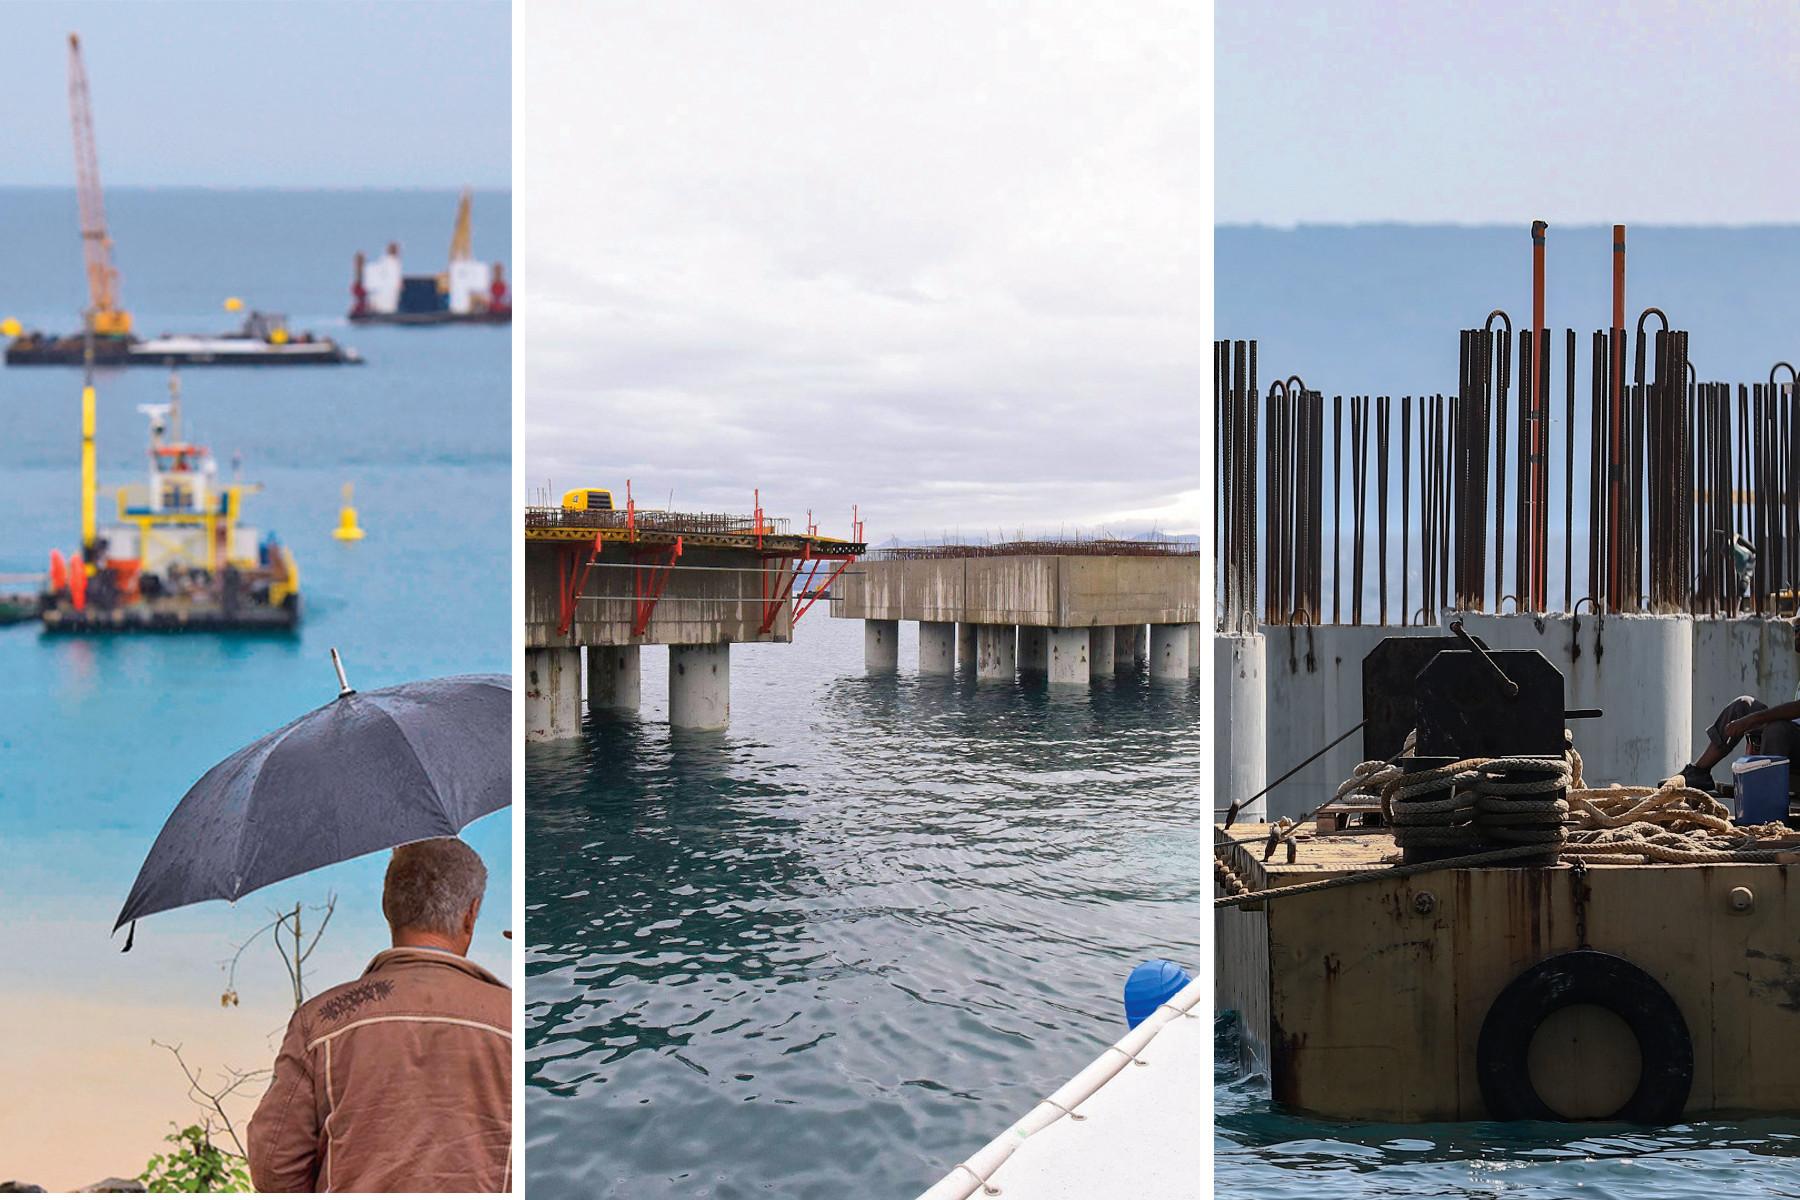 Obilazak gradilista LNG terminala u Omišlju